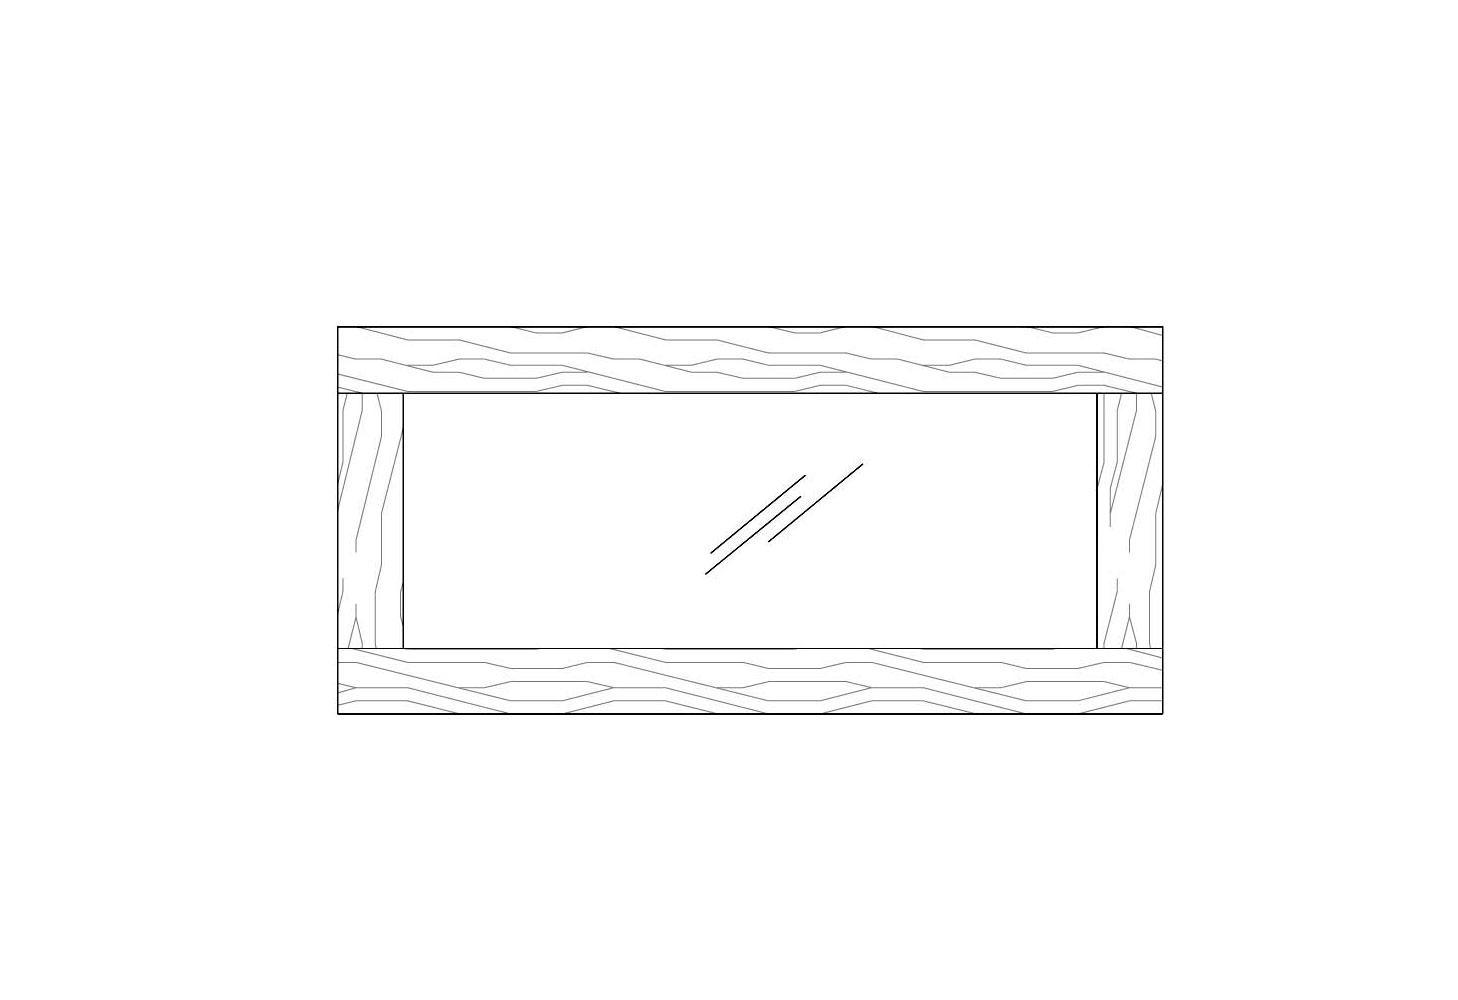 specchio-160-bixio-disegno